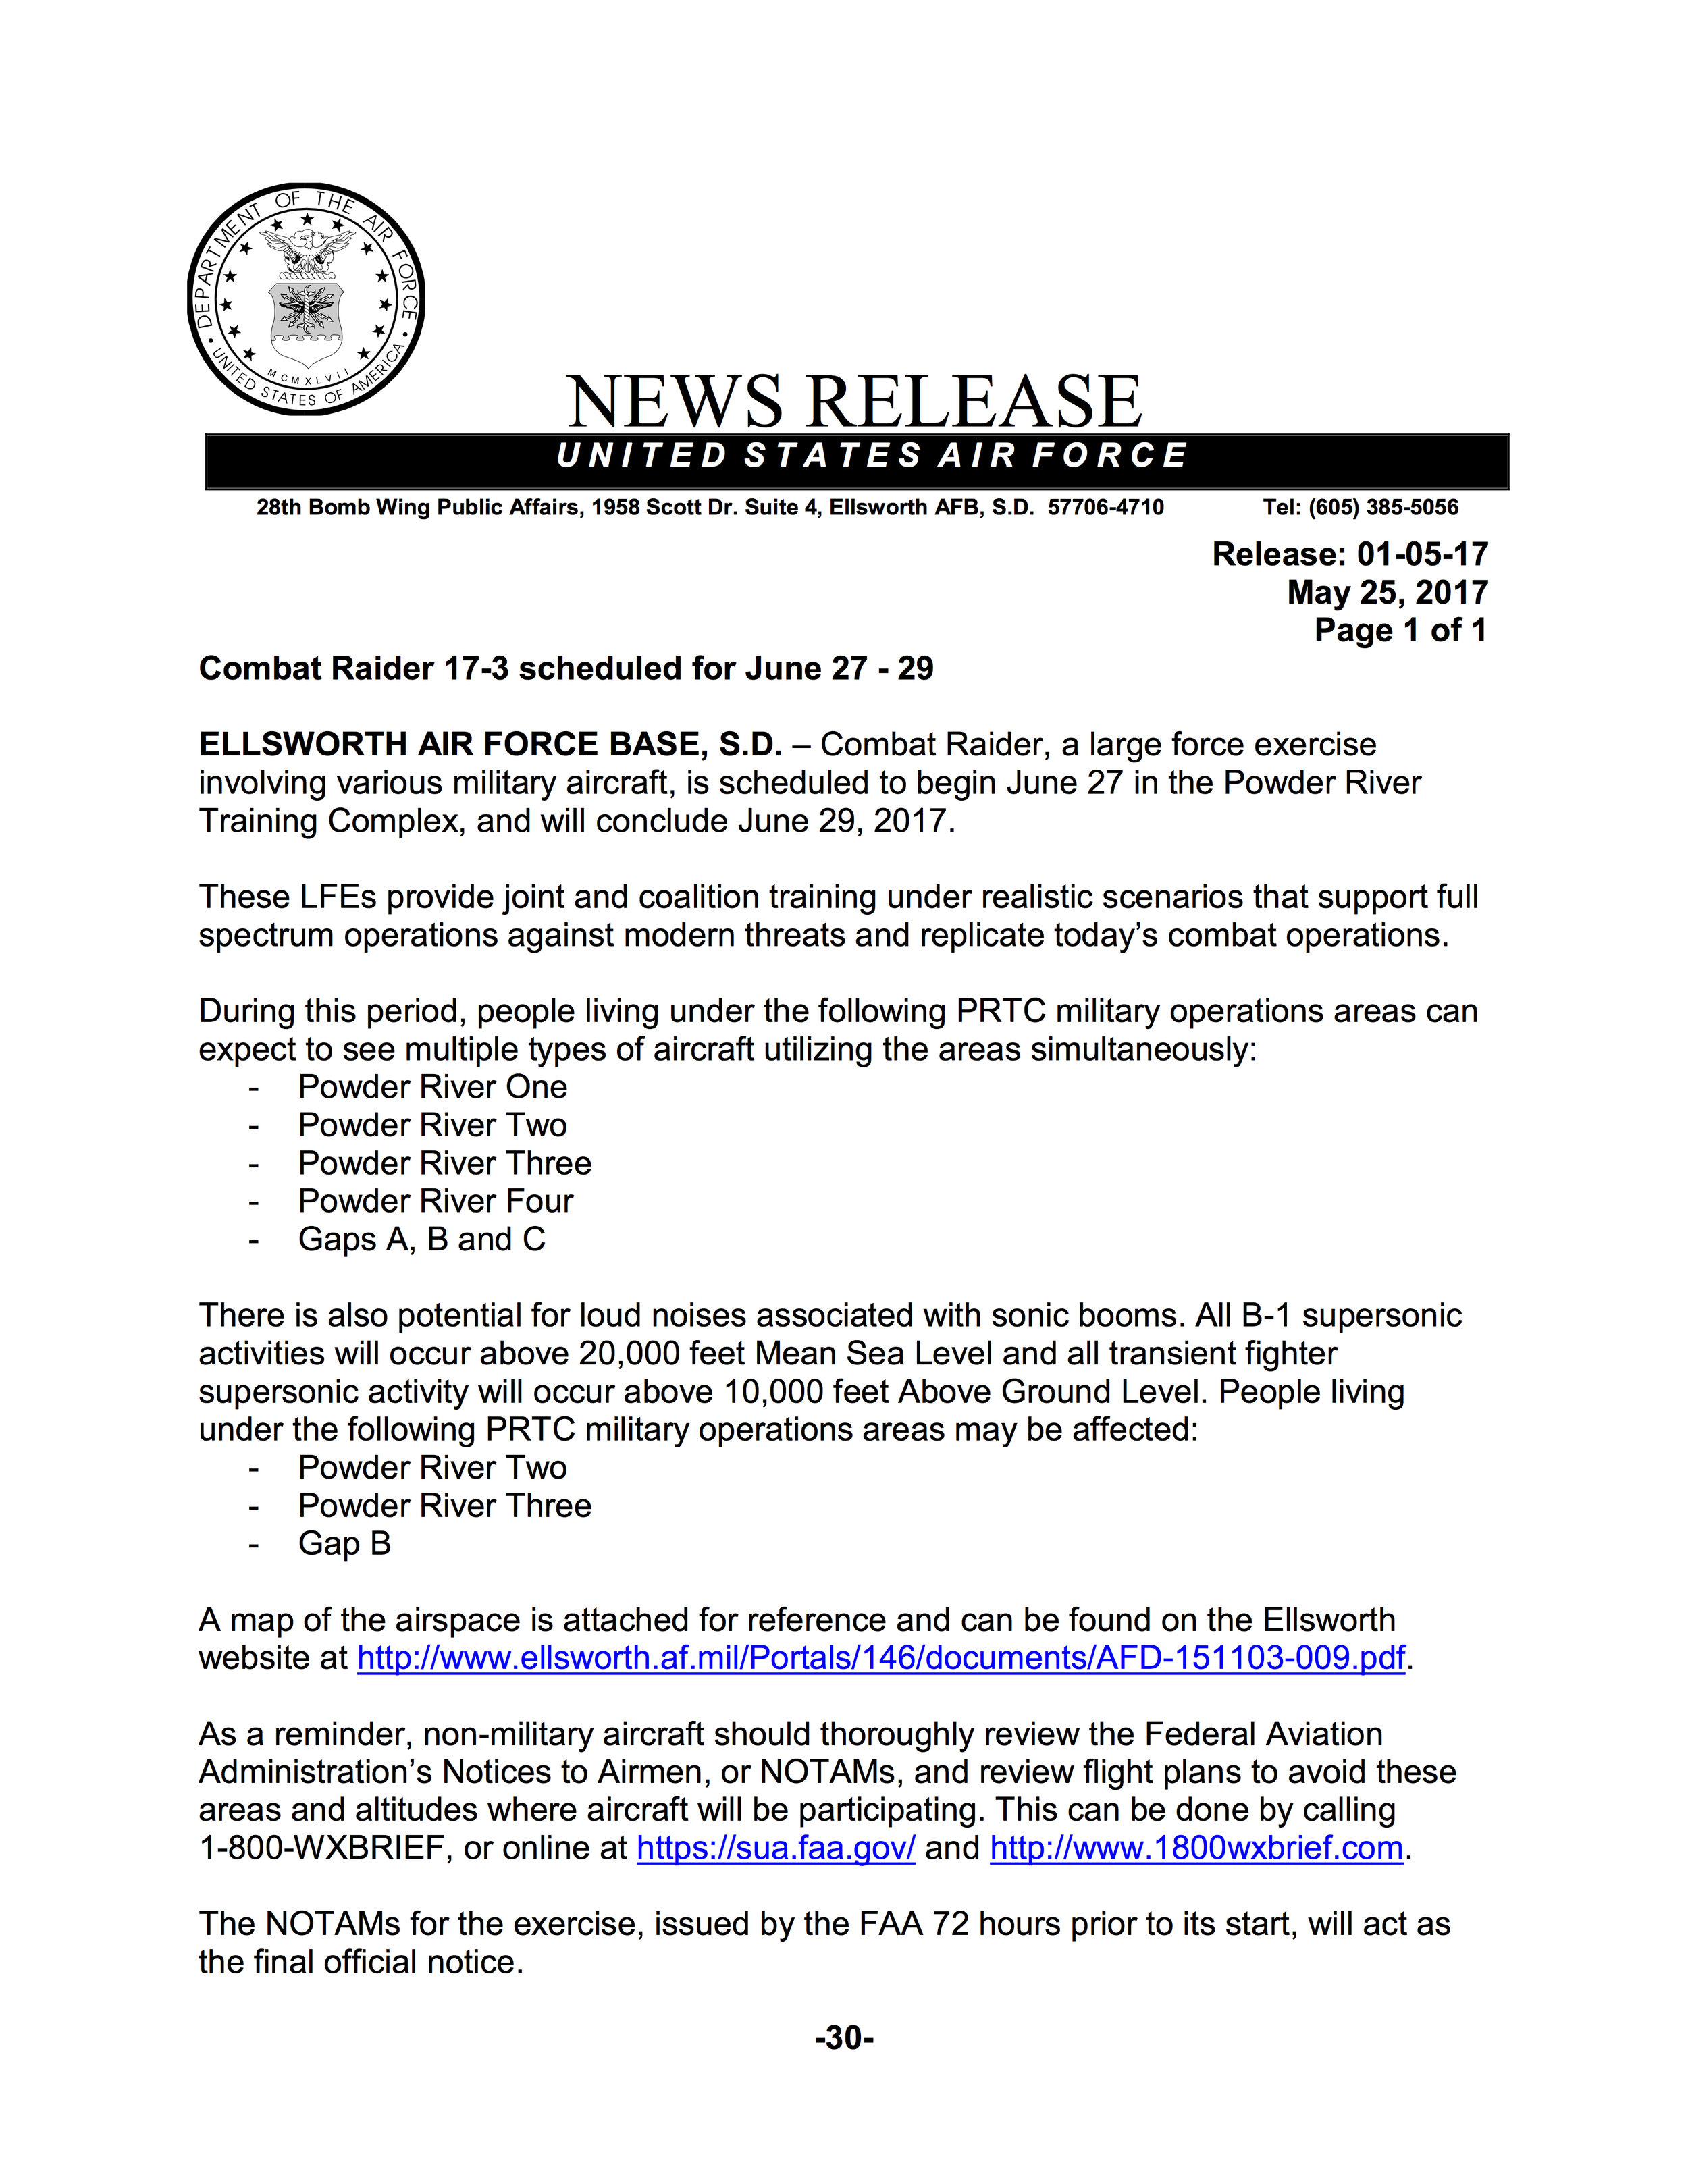 News Release 010517 - Combat Raider Scheduled for June 27 -29.jpg